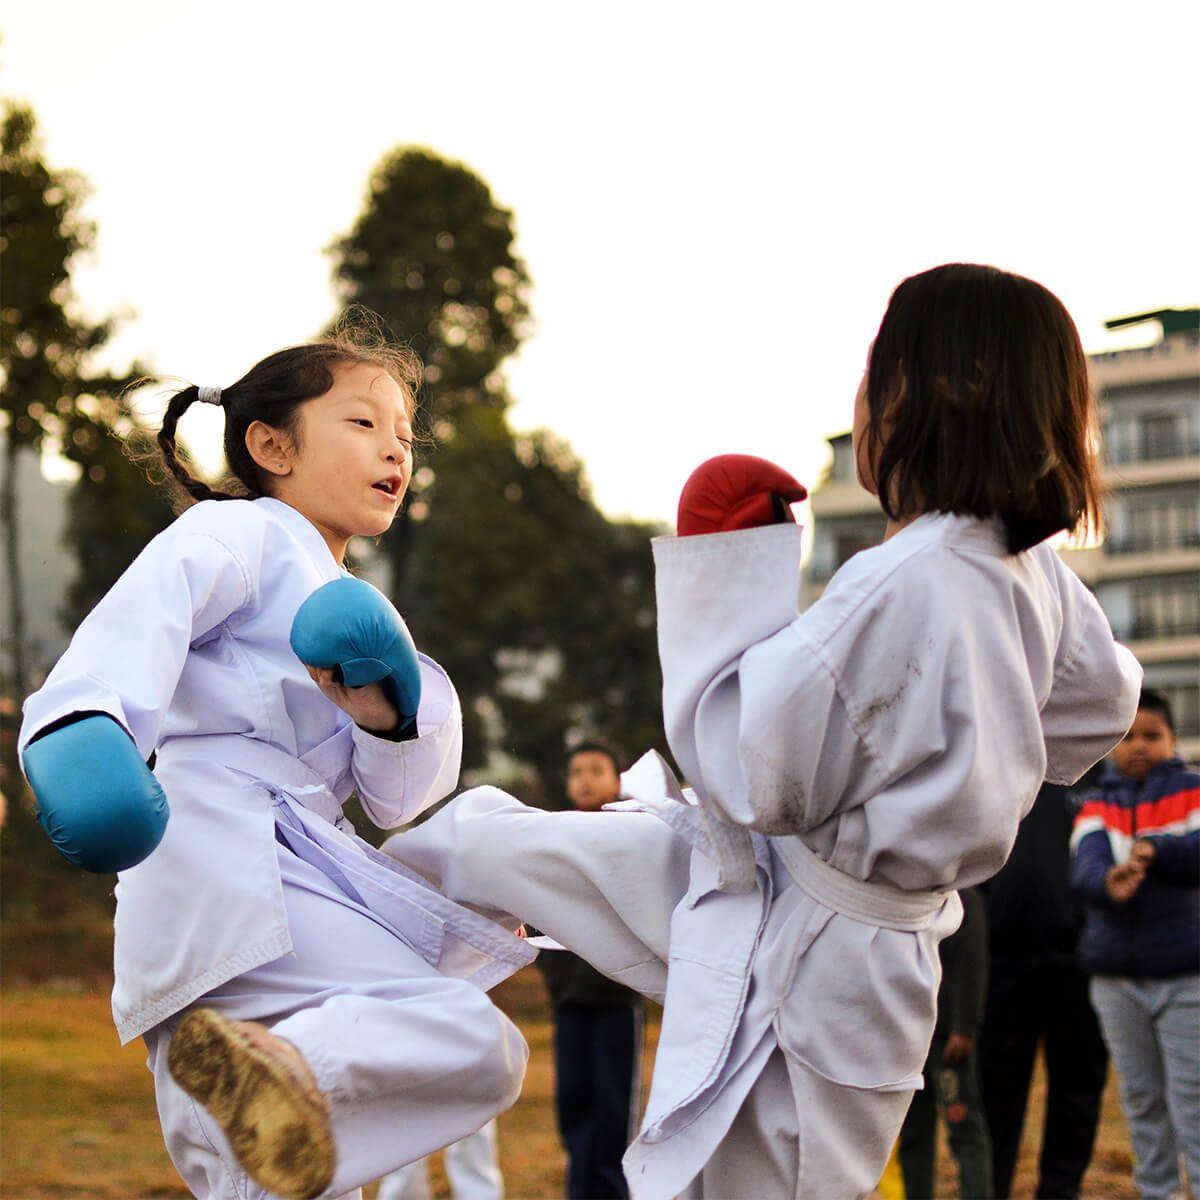 Karate around the world in this world